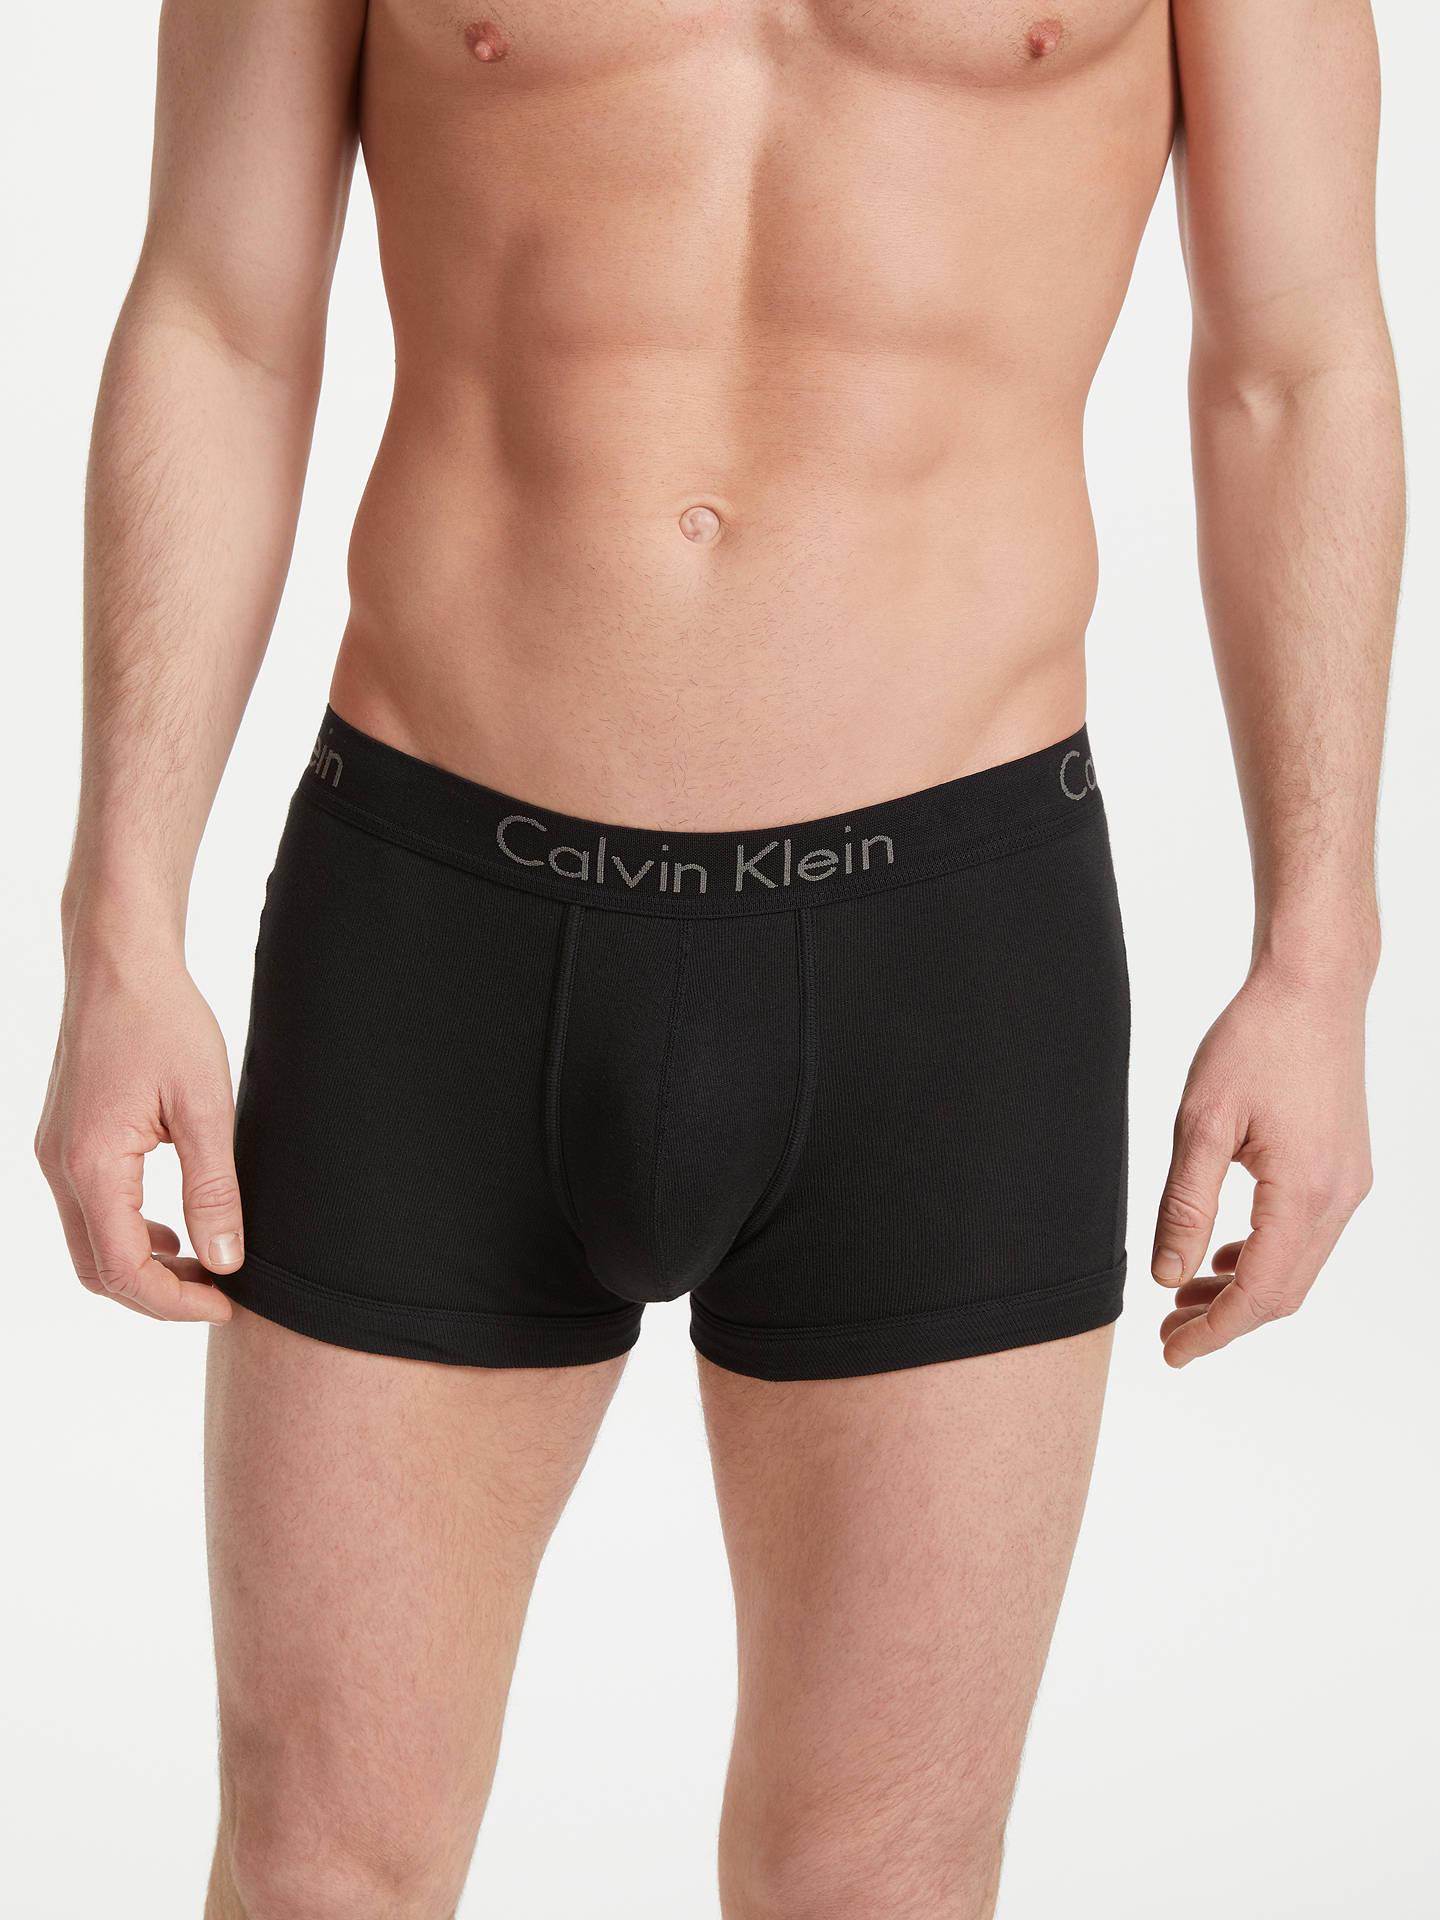 96a8c54c9d Buy Calvin Klein Body Trunks